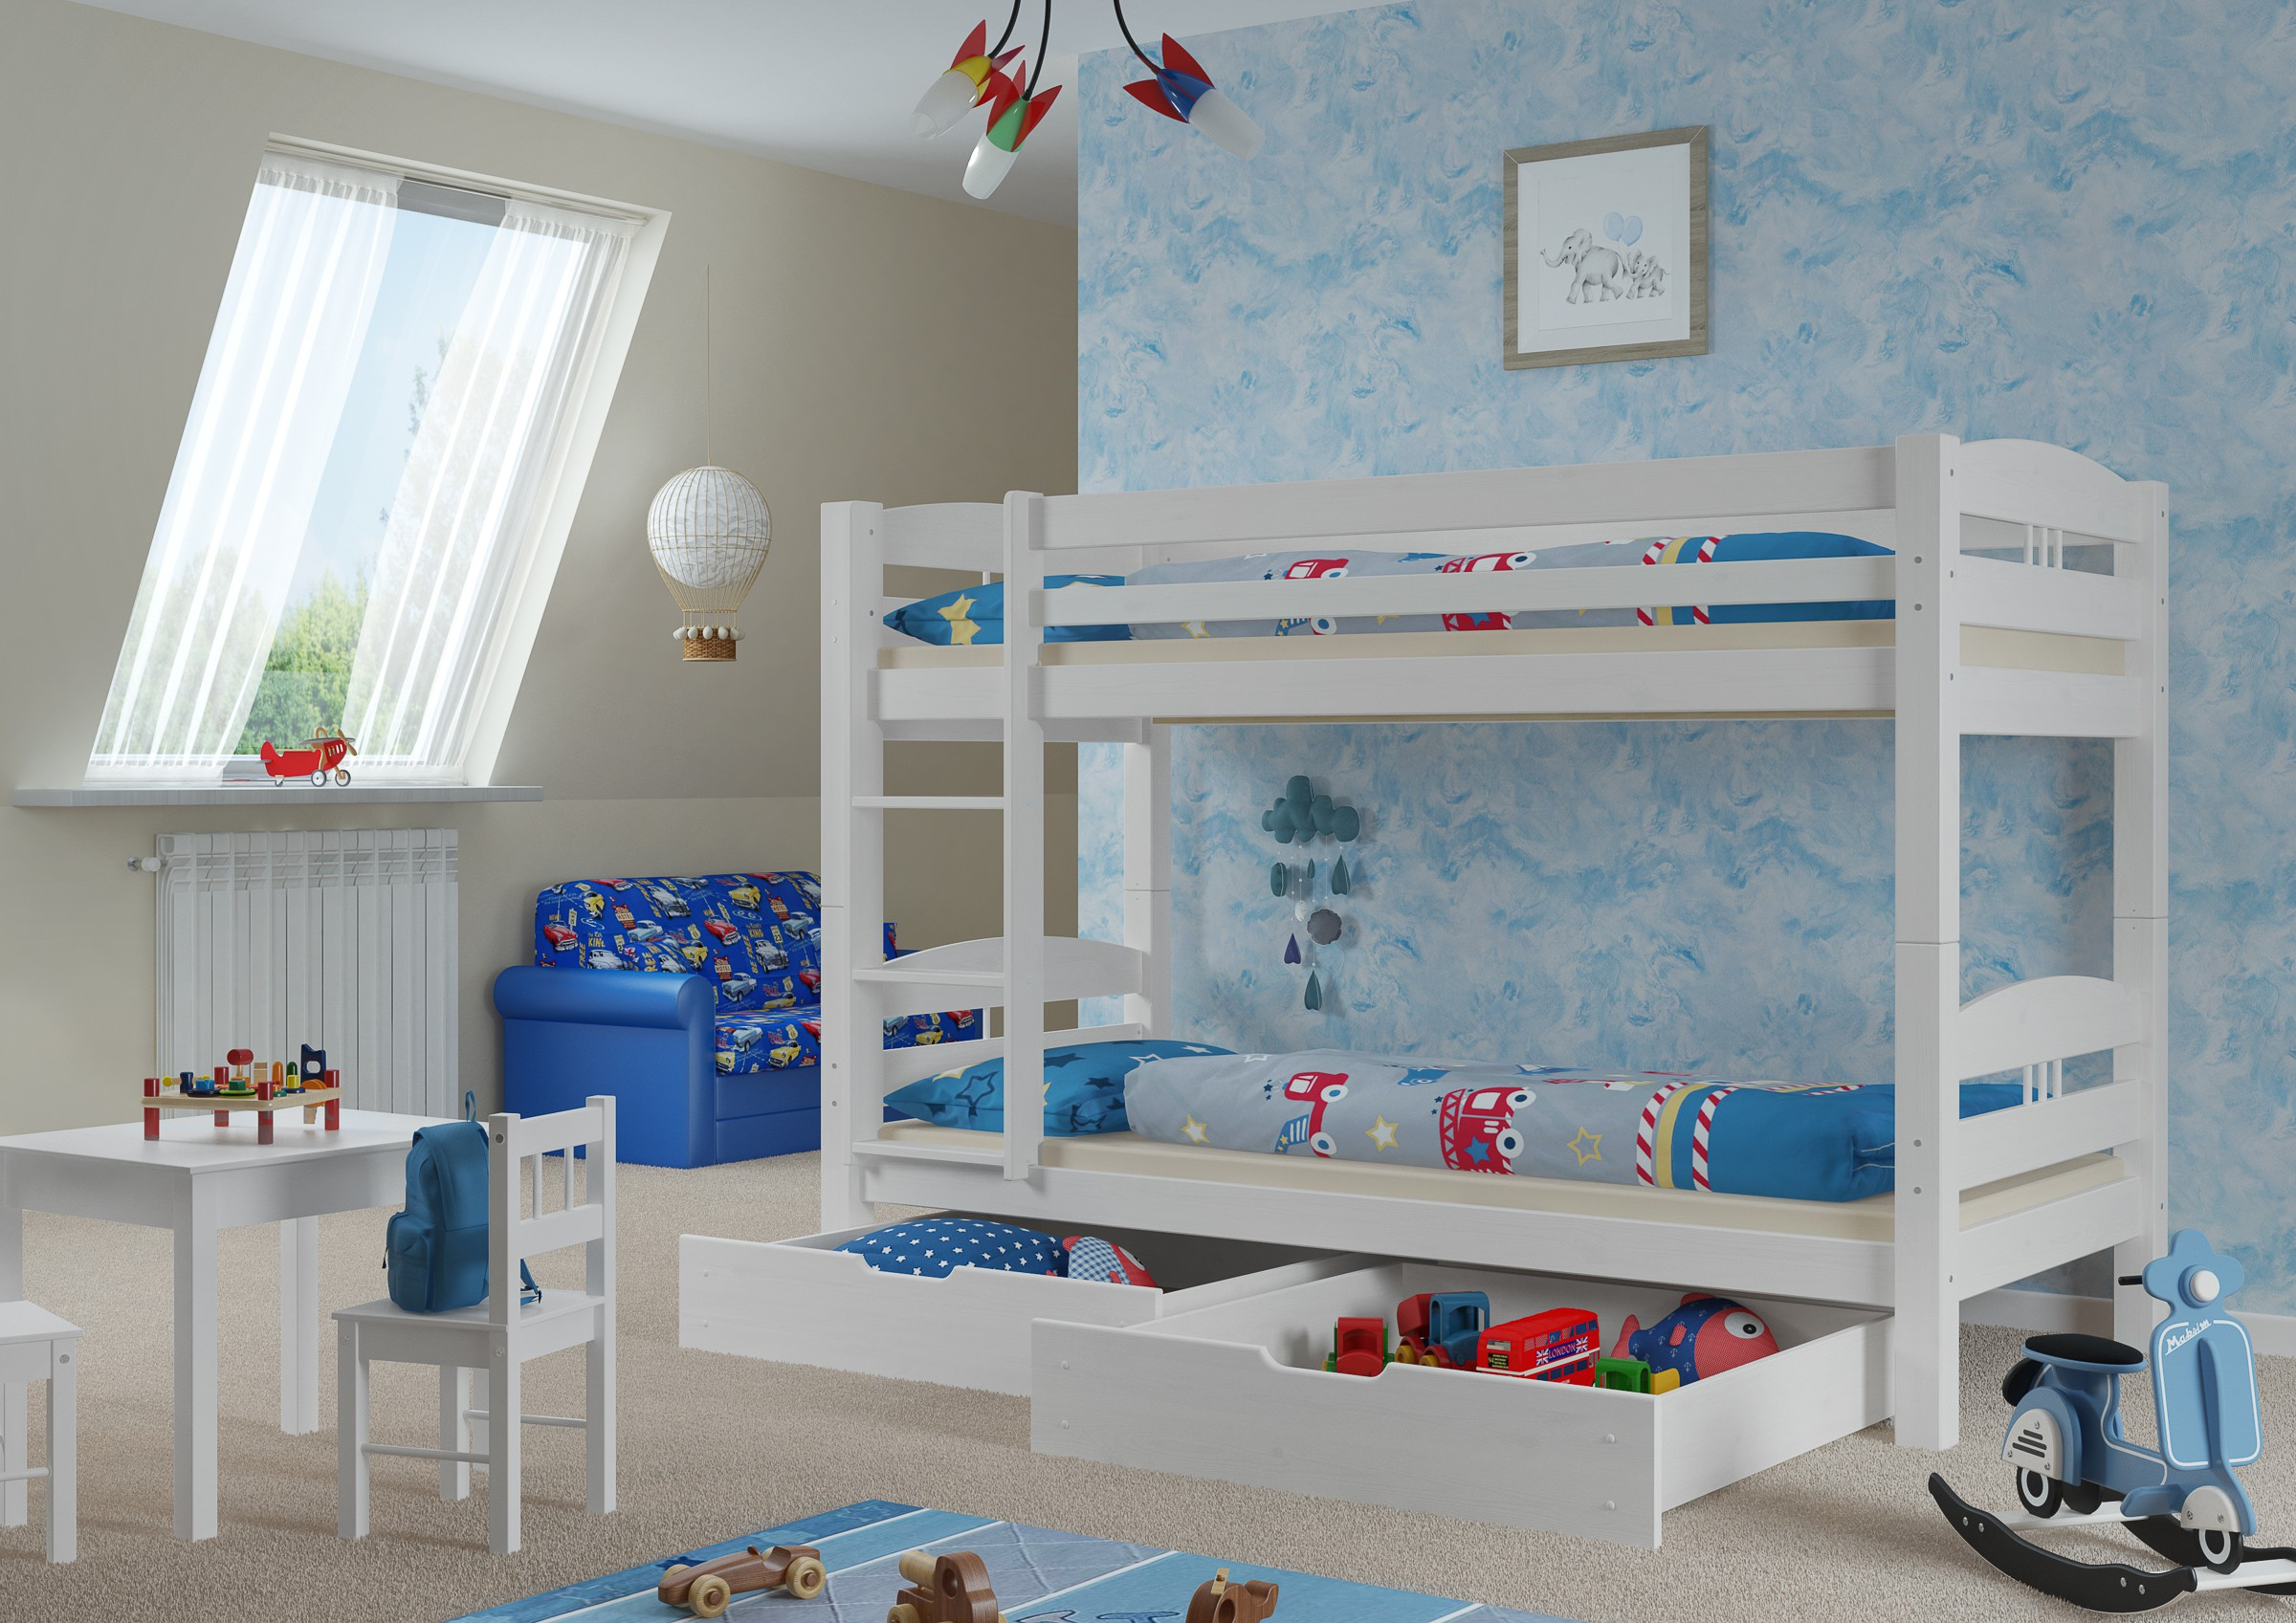 Etagenbett Weiss 90x200 : Kinder etagenbett weiß rückwand pink amazon küche